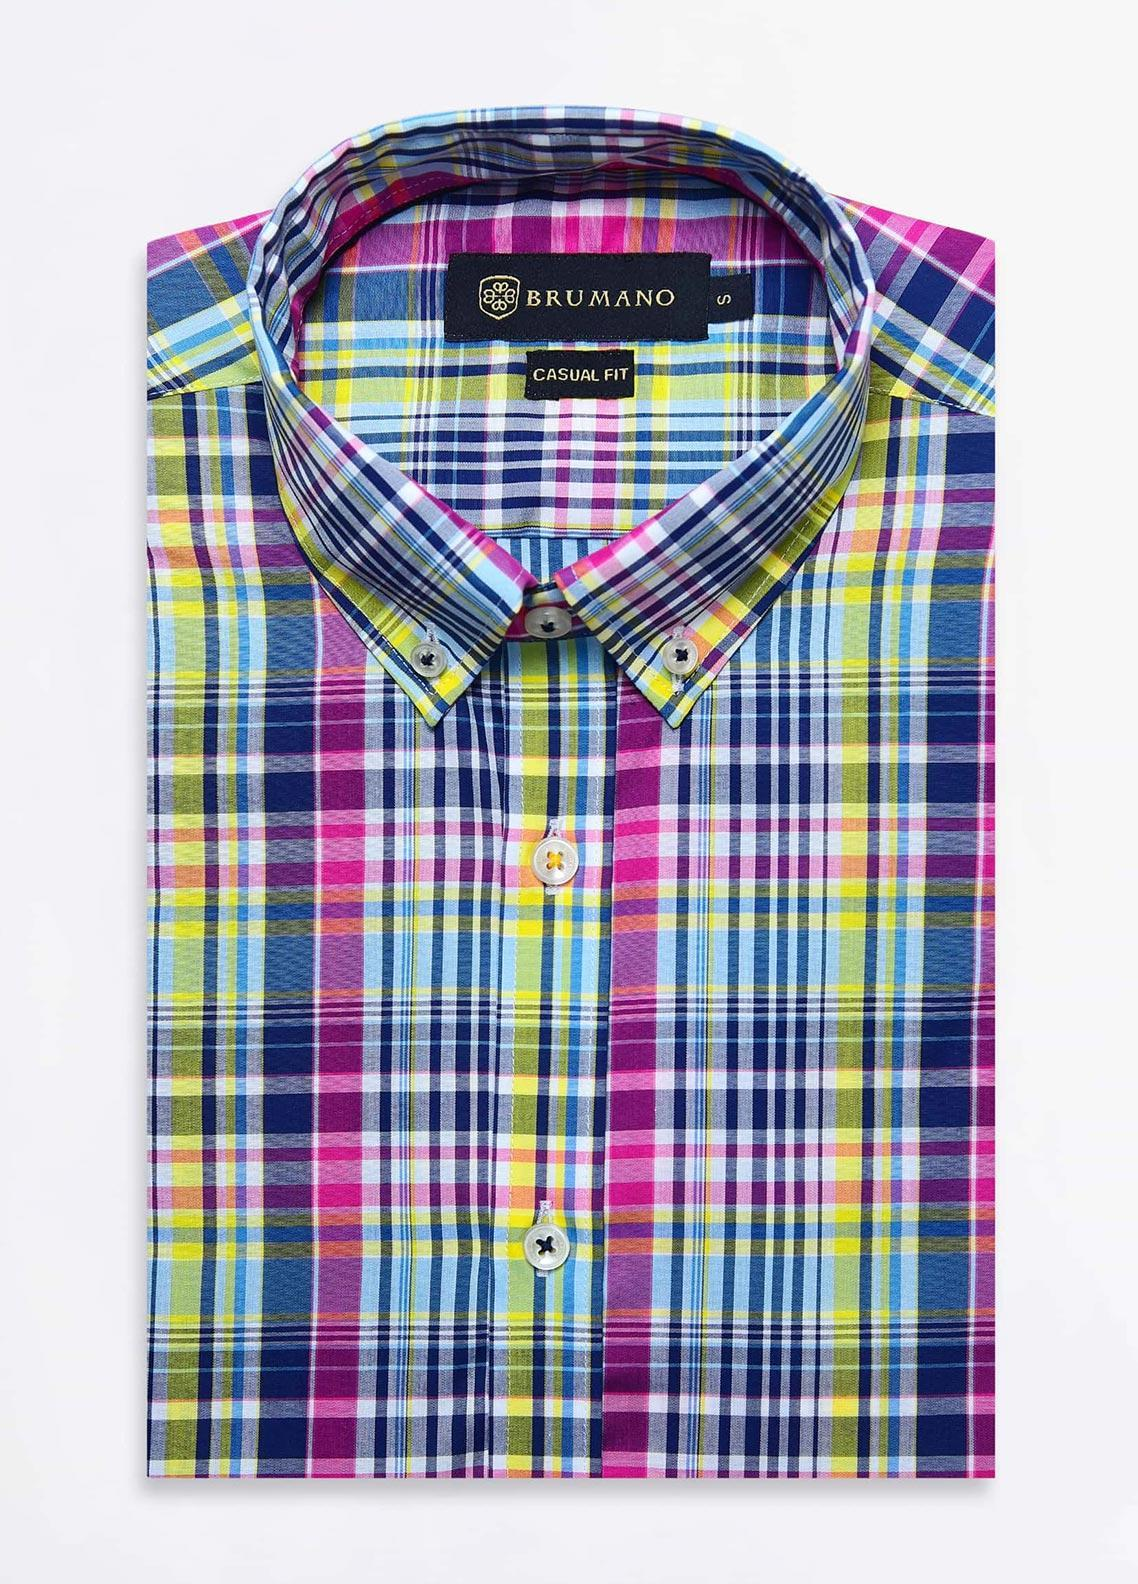 Brumano Cotton Formal Shirts for Men -  BRM-1021